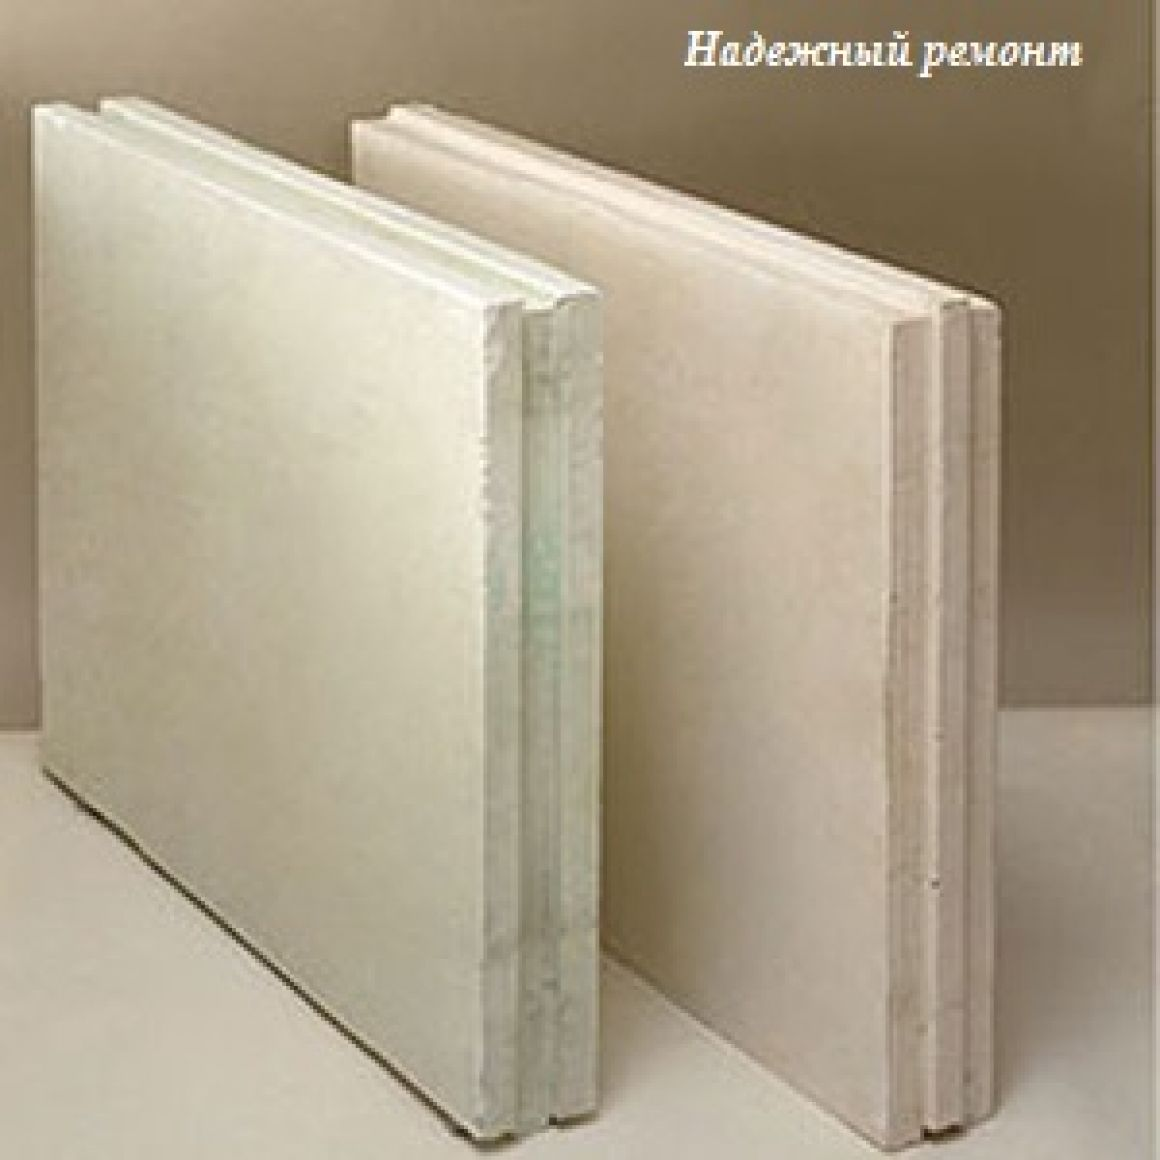 Пазогребневые плиты в Омске